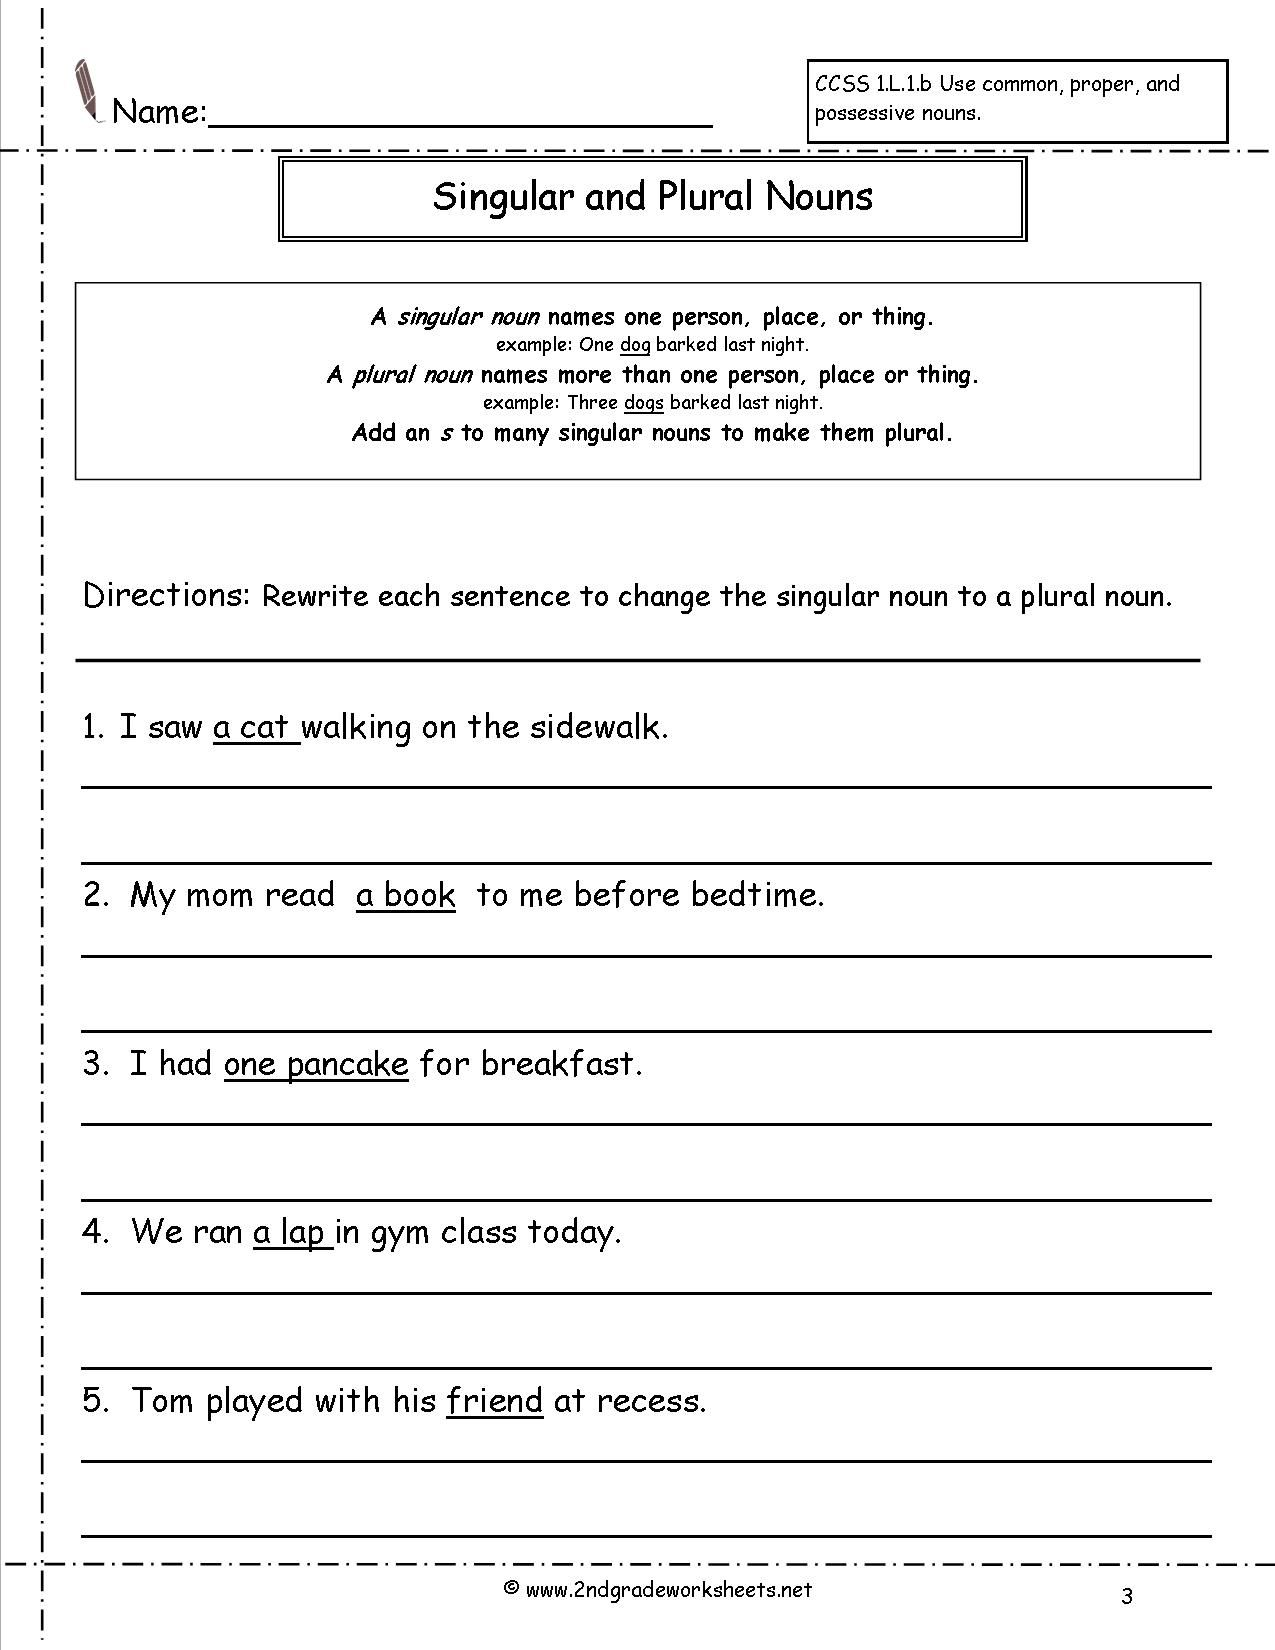 Singular And Plural Nouns Worksheet Teacher Stuff Pinterest